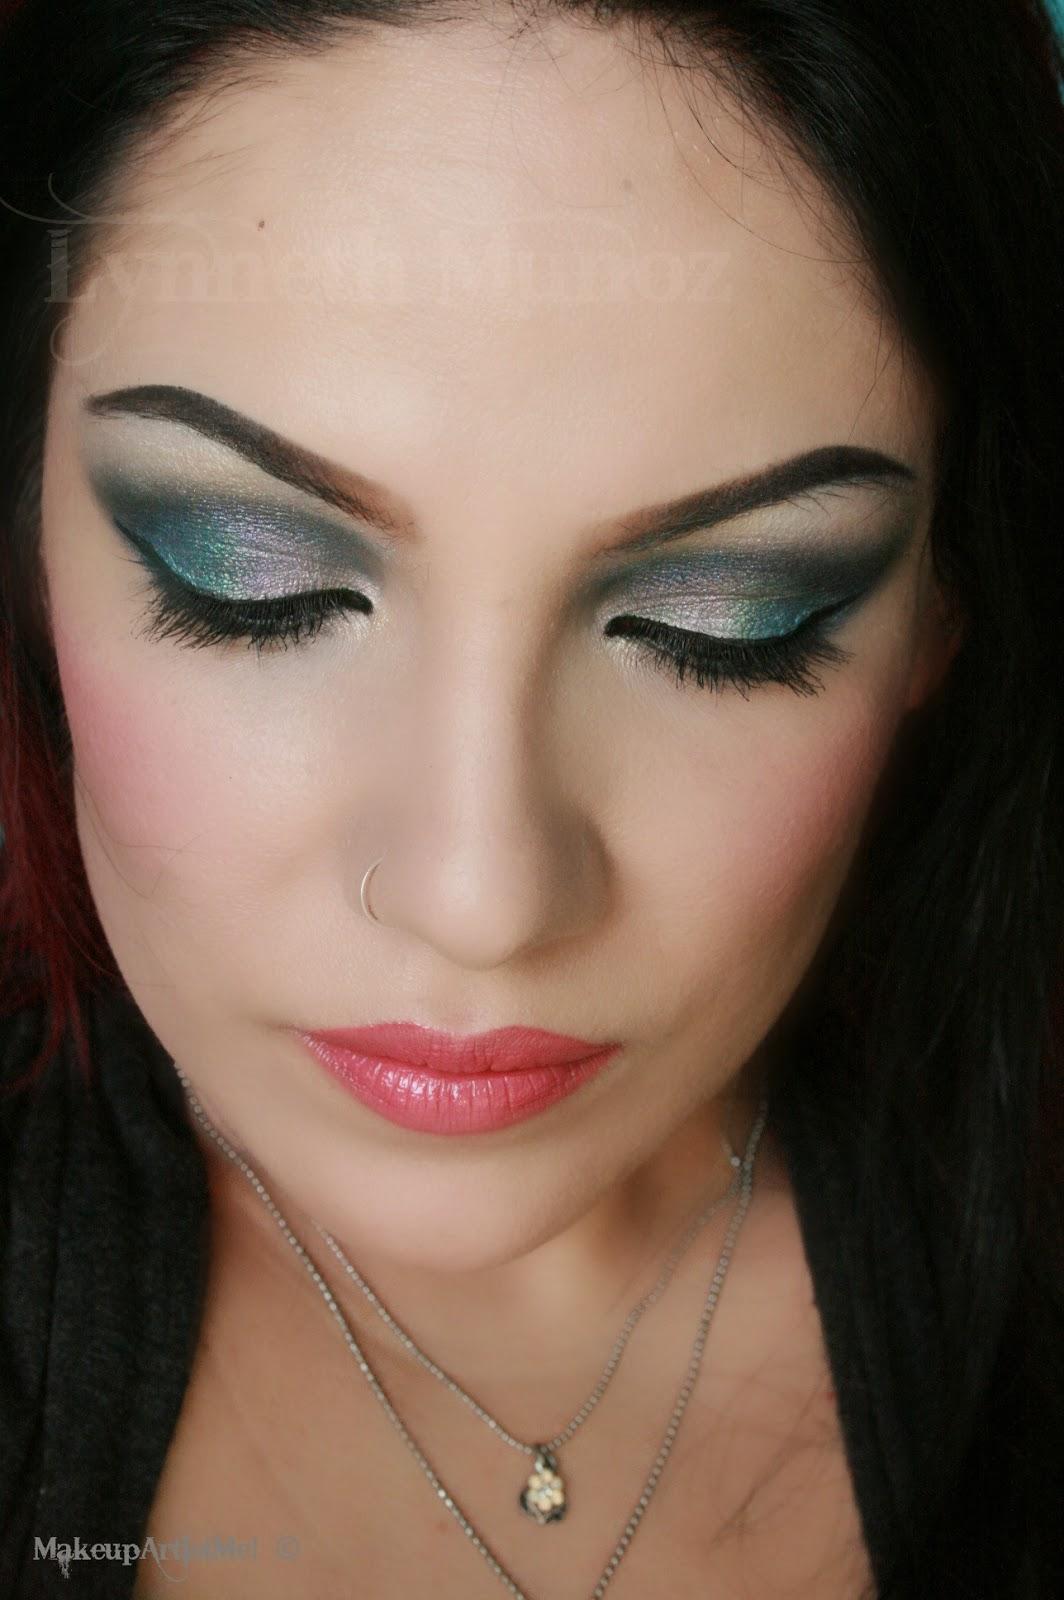 Make Up Artist Me Silver Lining Makeup Tutorial